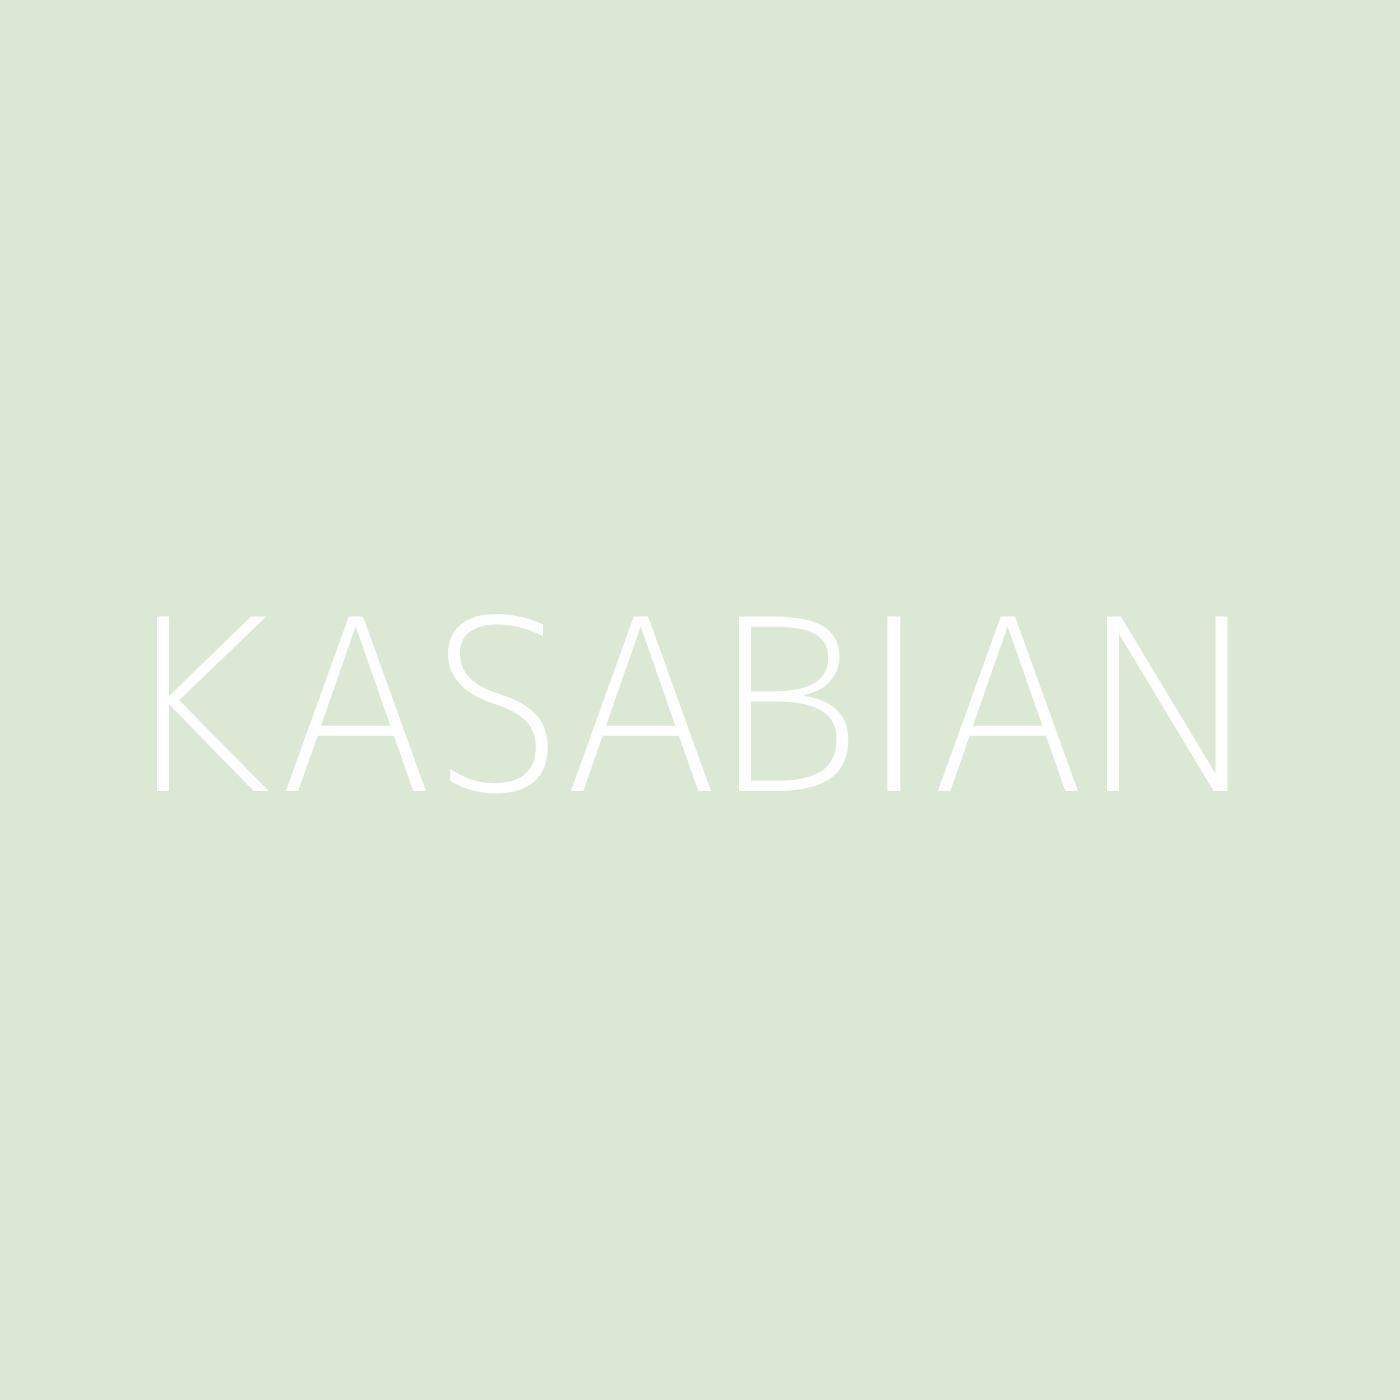 Kasabian Playlist Artwork